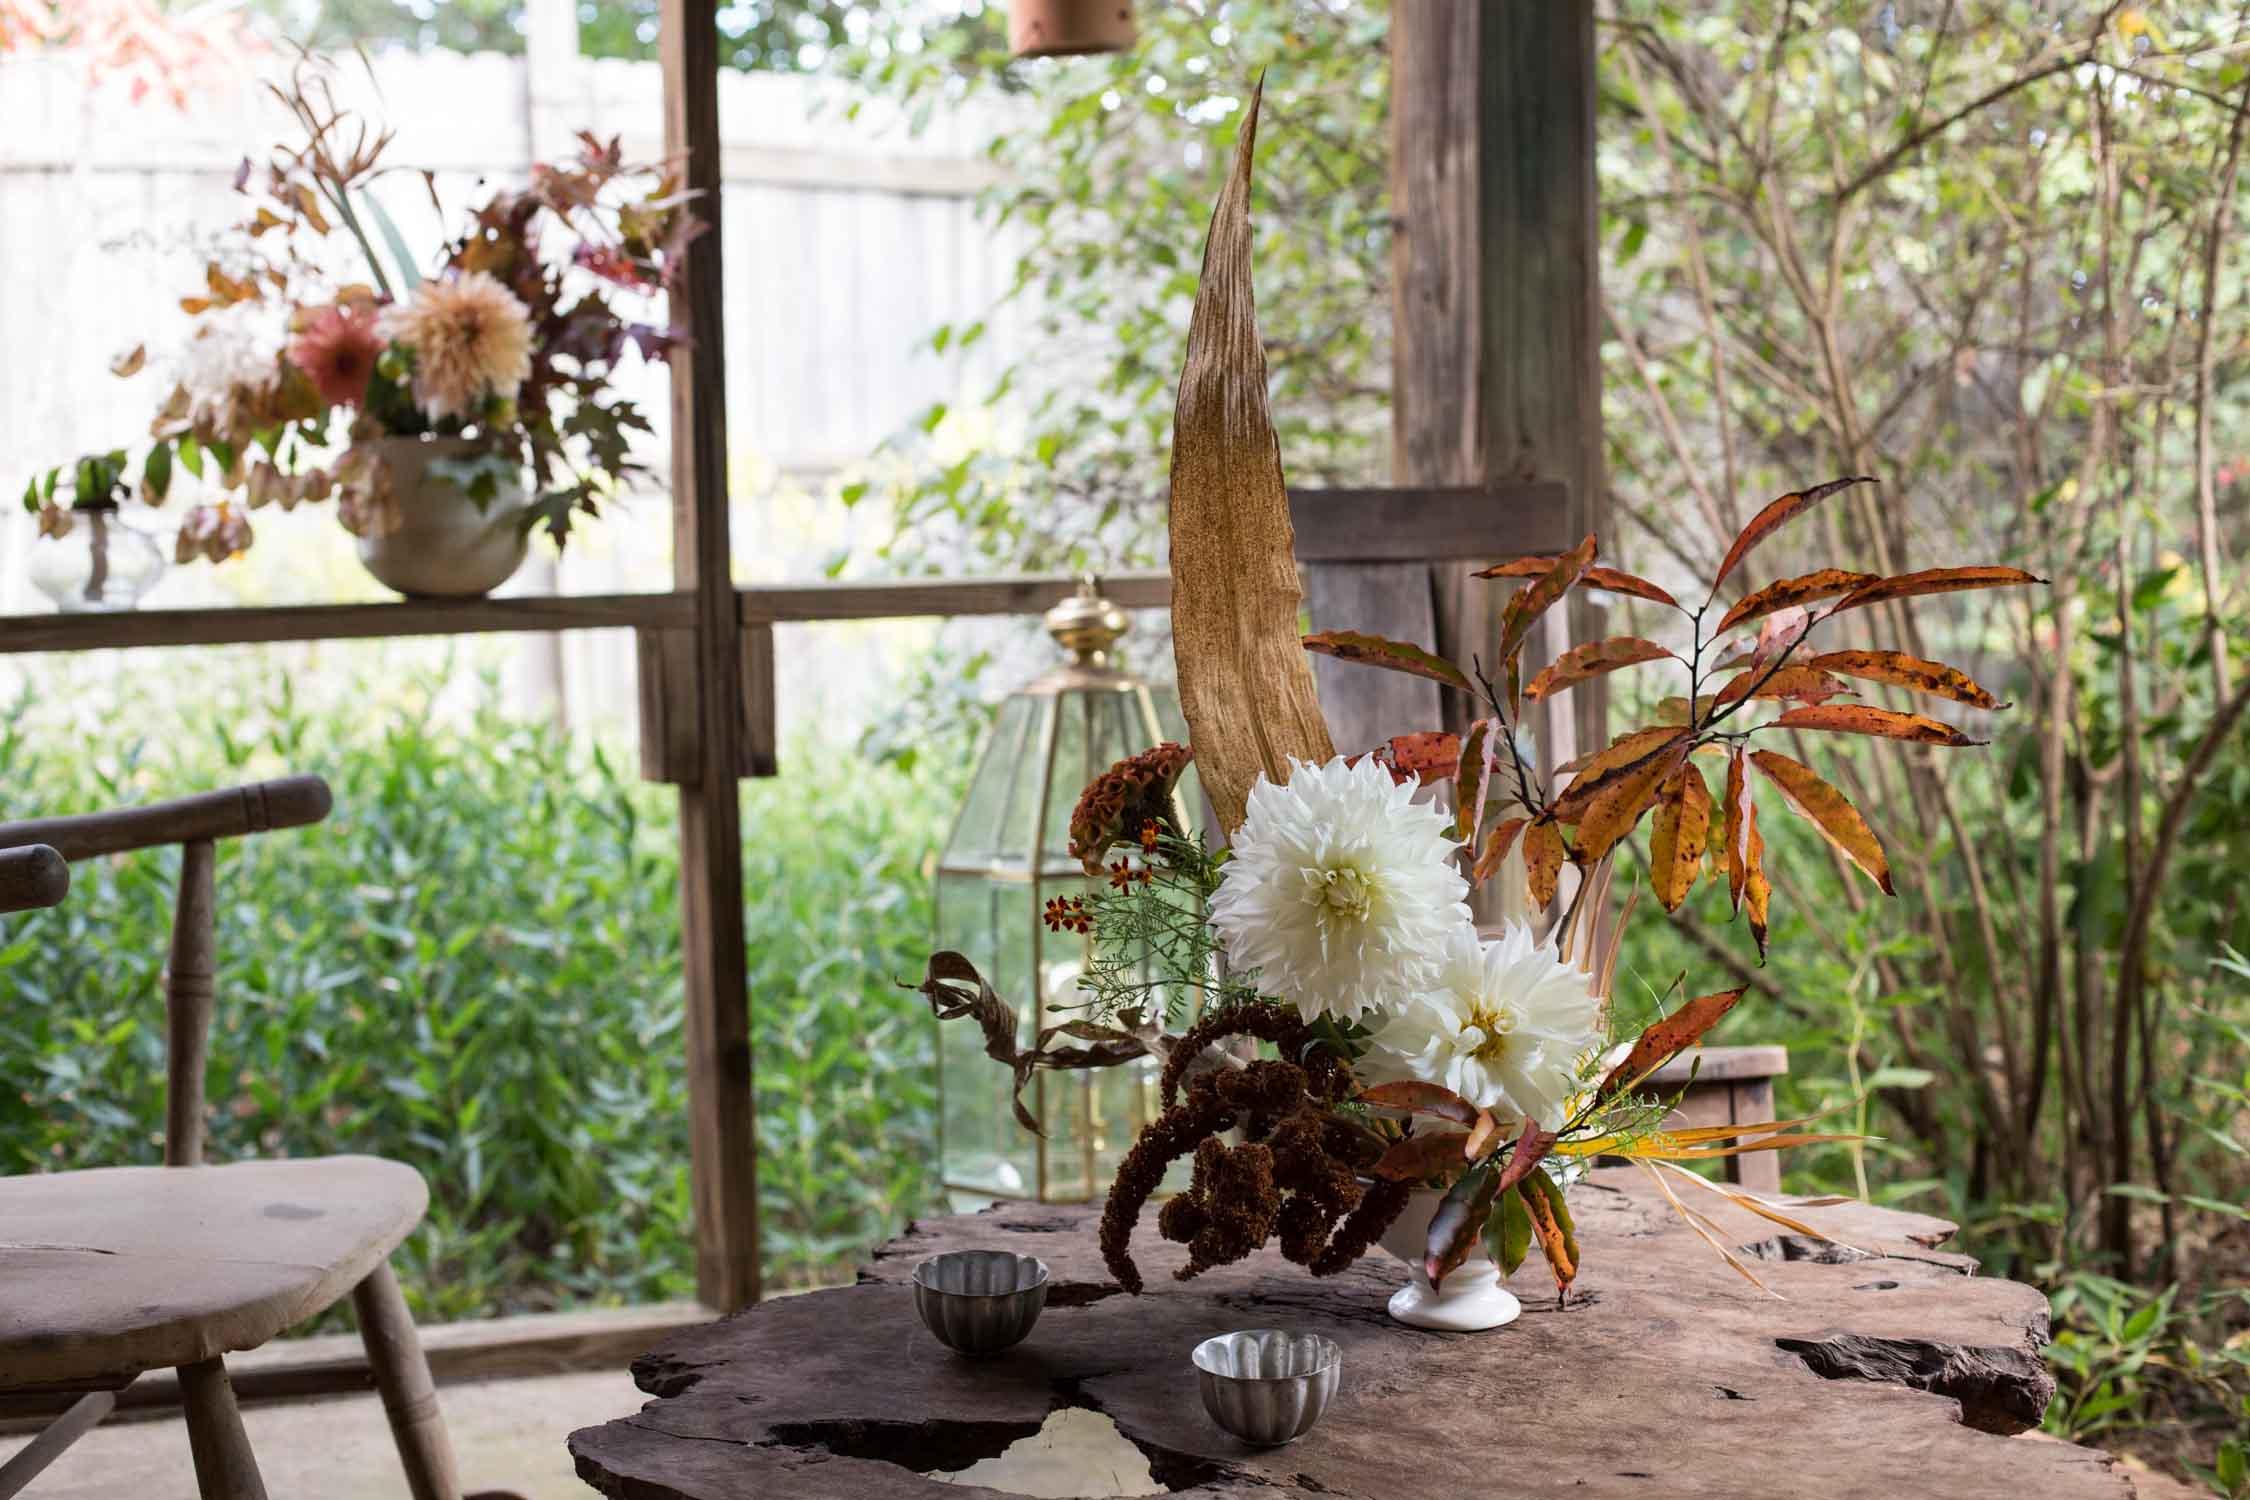 RA_3 porch farm 2016 flower social-201610175071.jpg